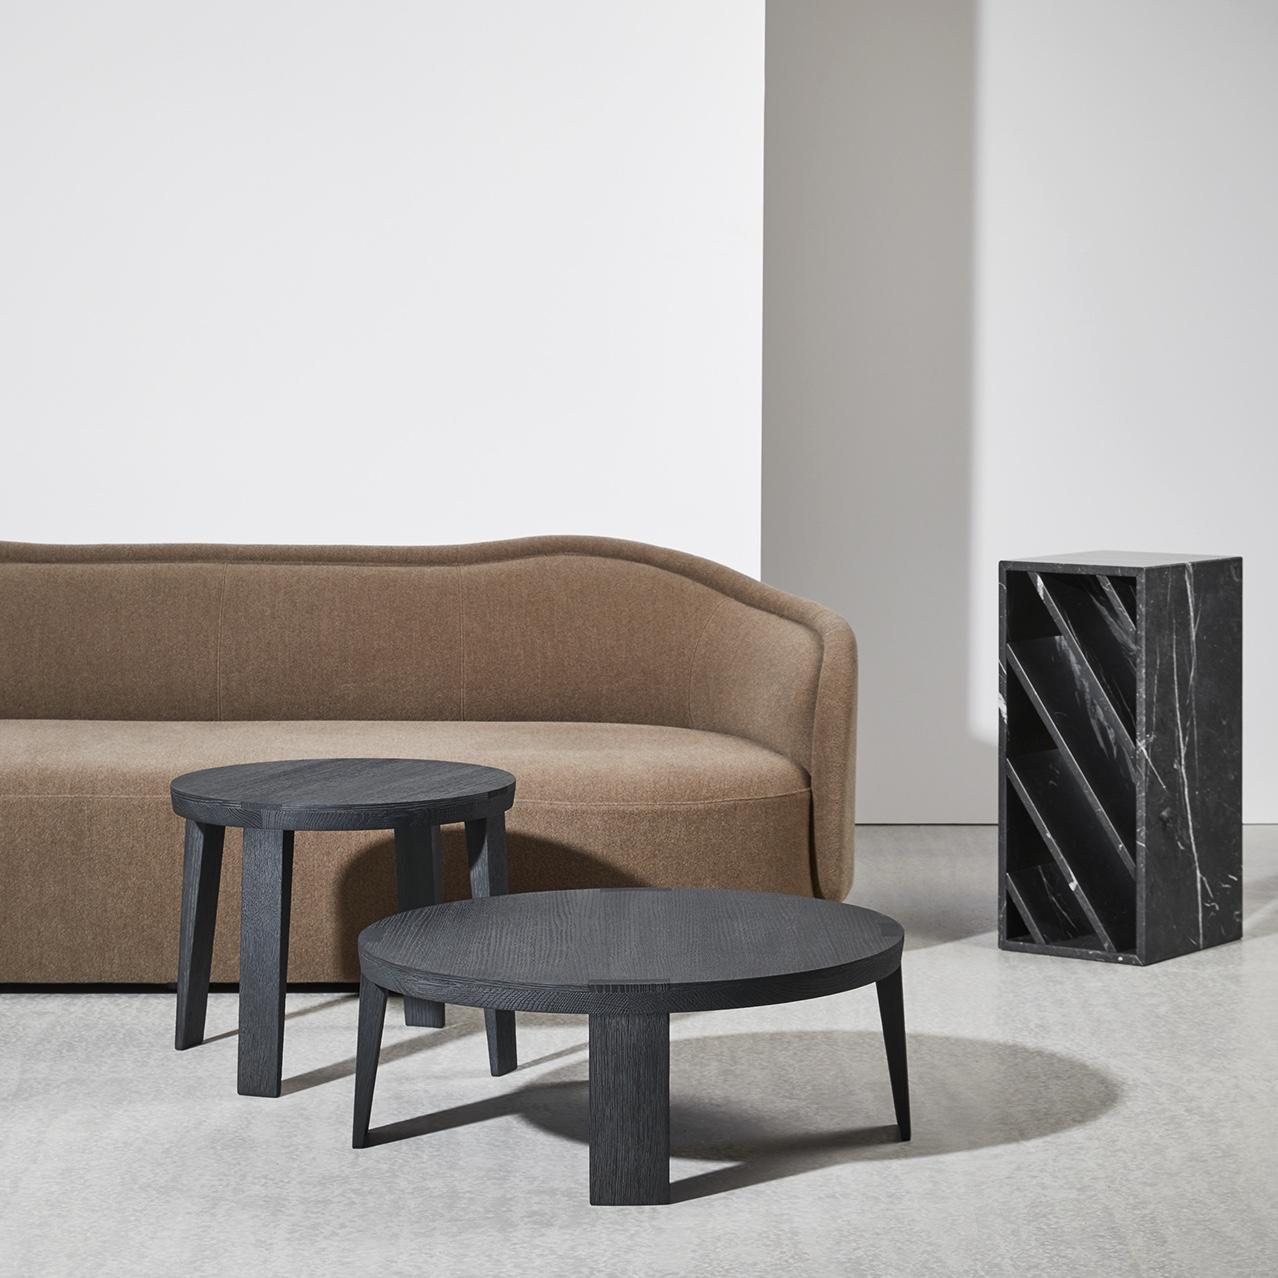 SUMO-LOW-TABLES-OAK-DAN-YEFFET-COLLECTION-PARTICULIERE